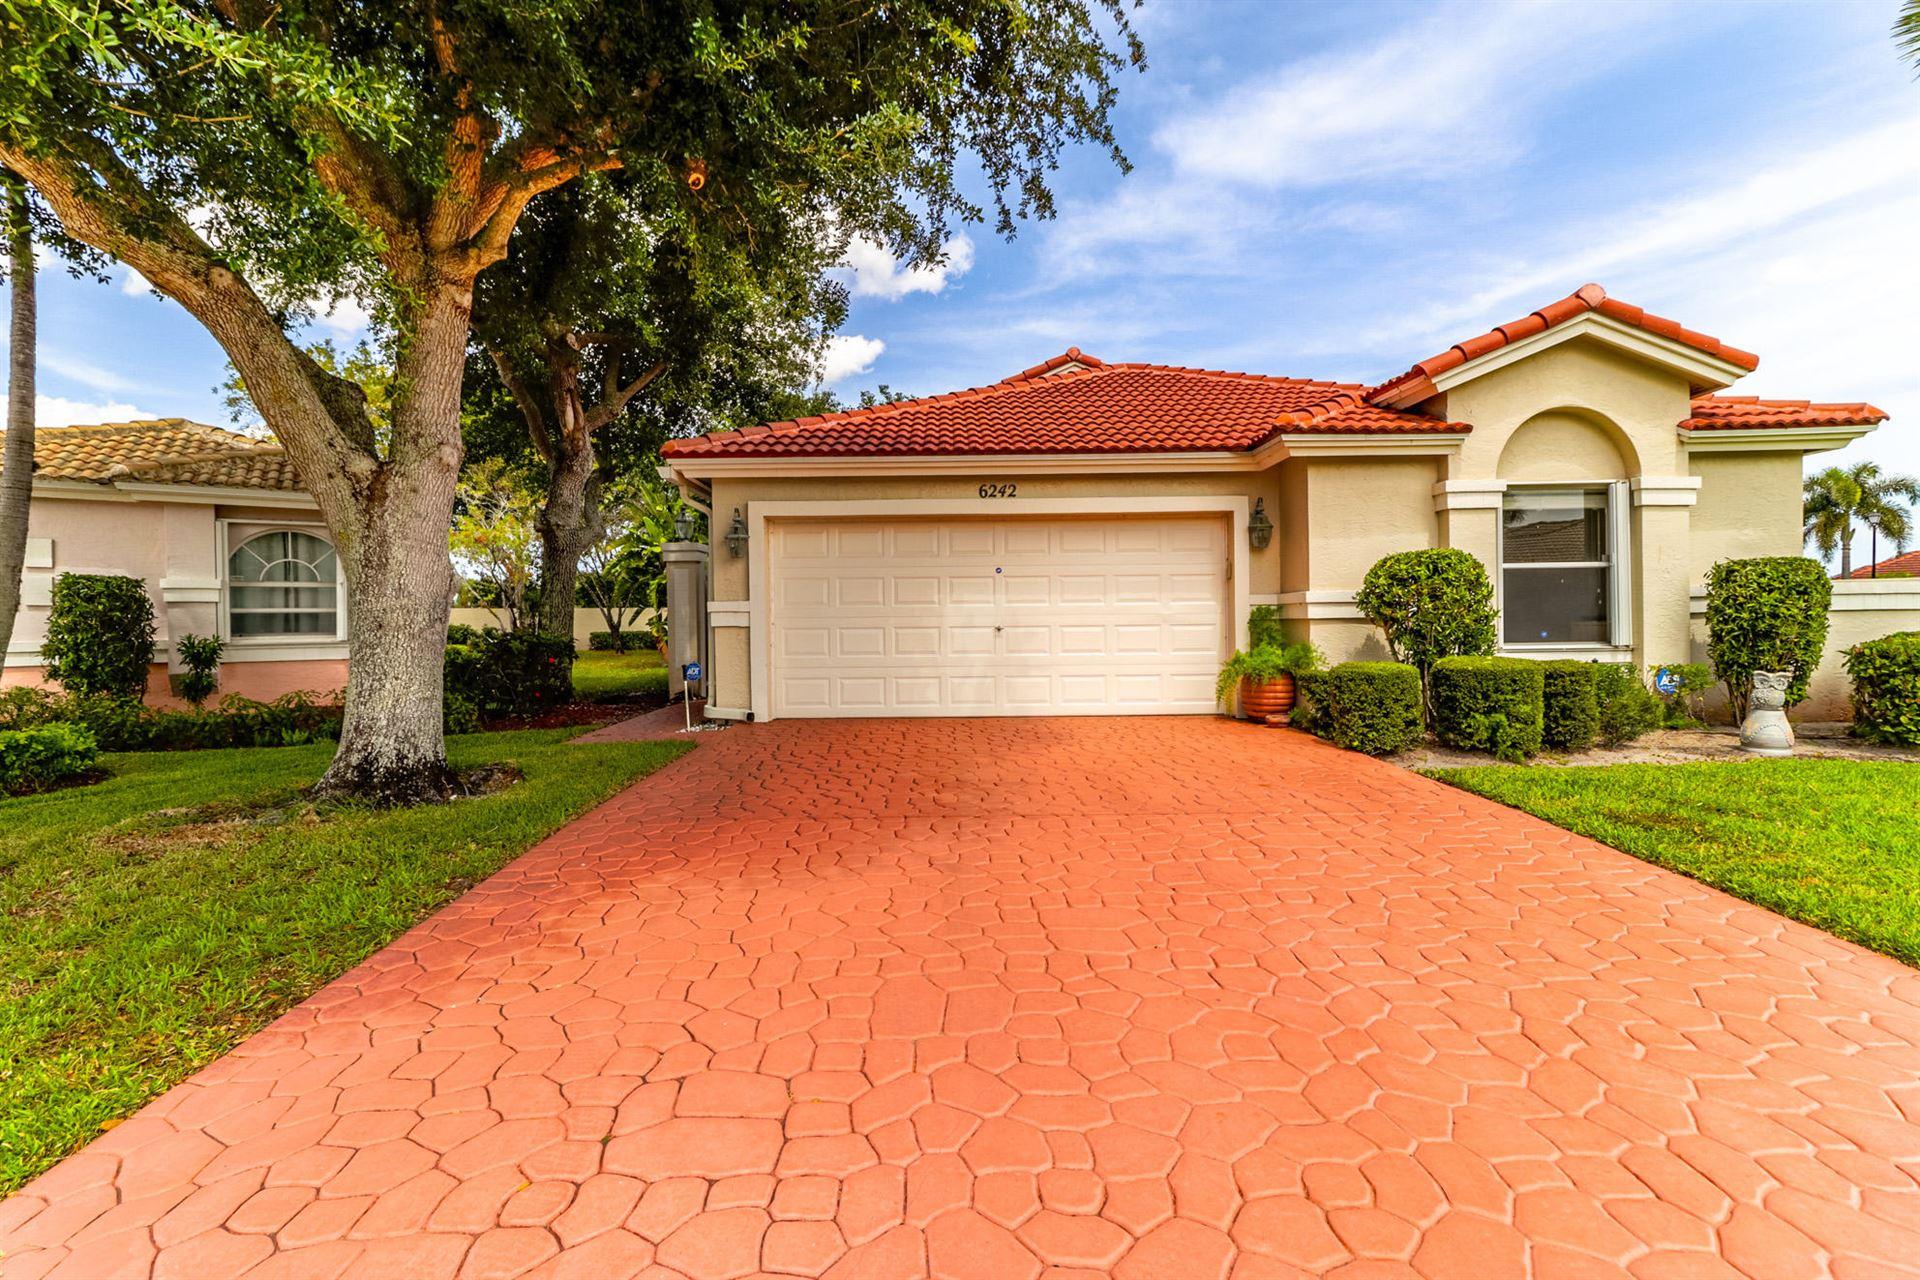 6242 Coral Reef Terrace, Boynton Beach, FL 33437 - #: RX-10706408